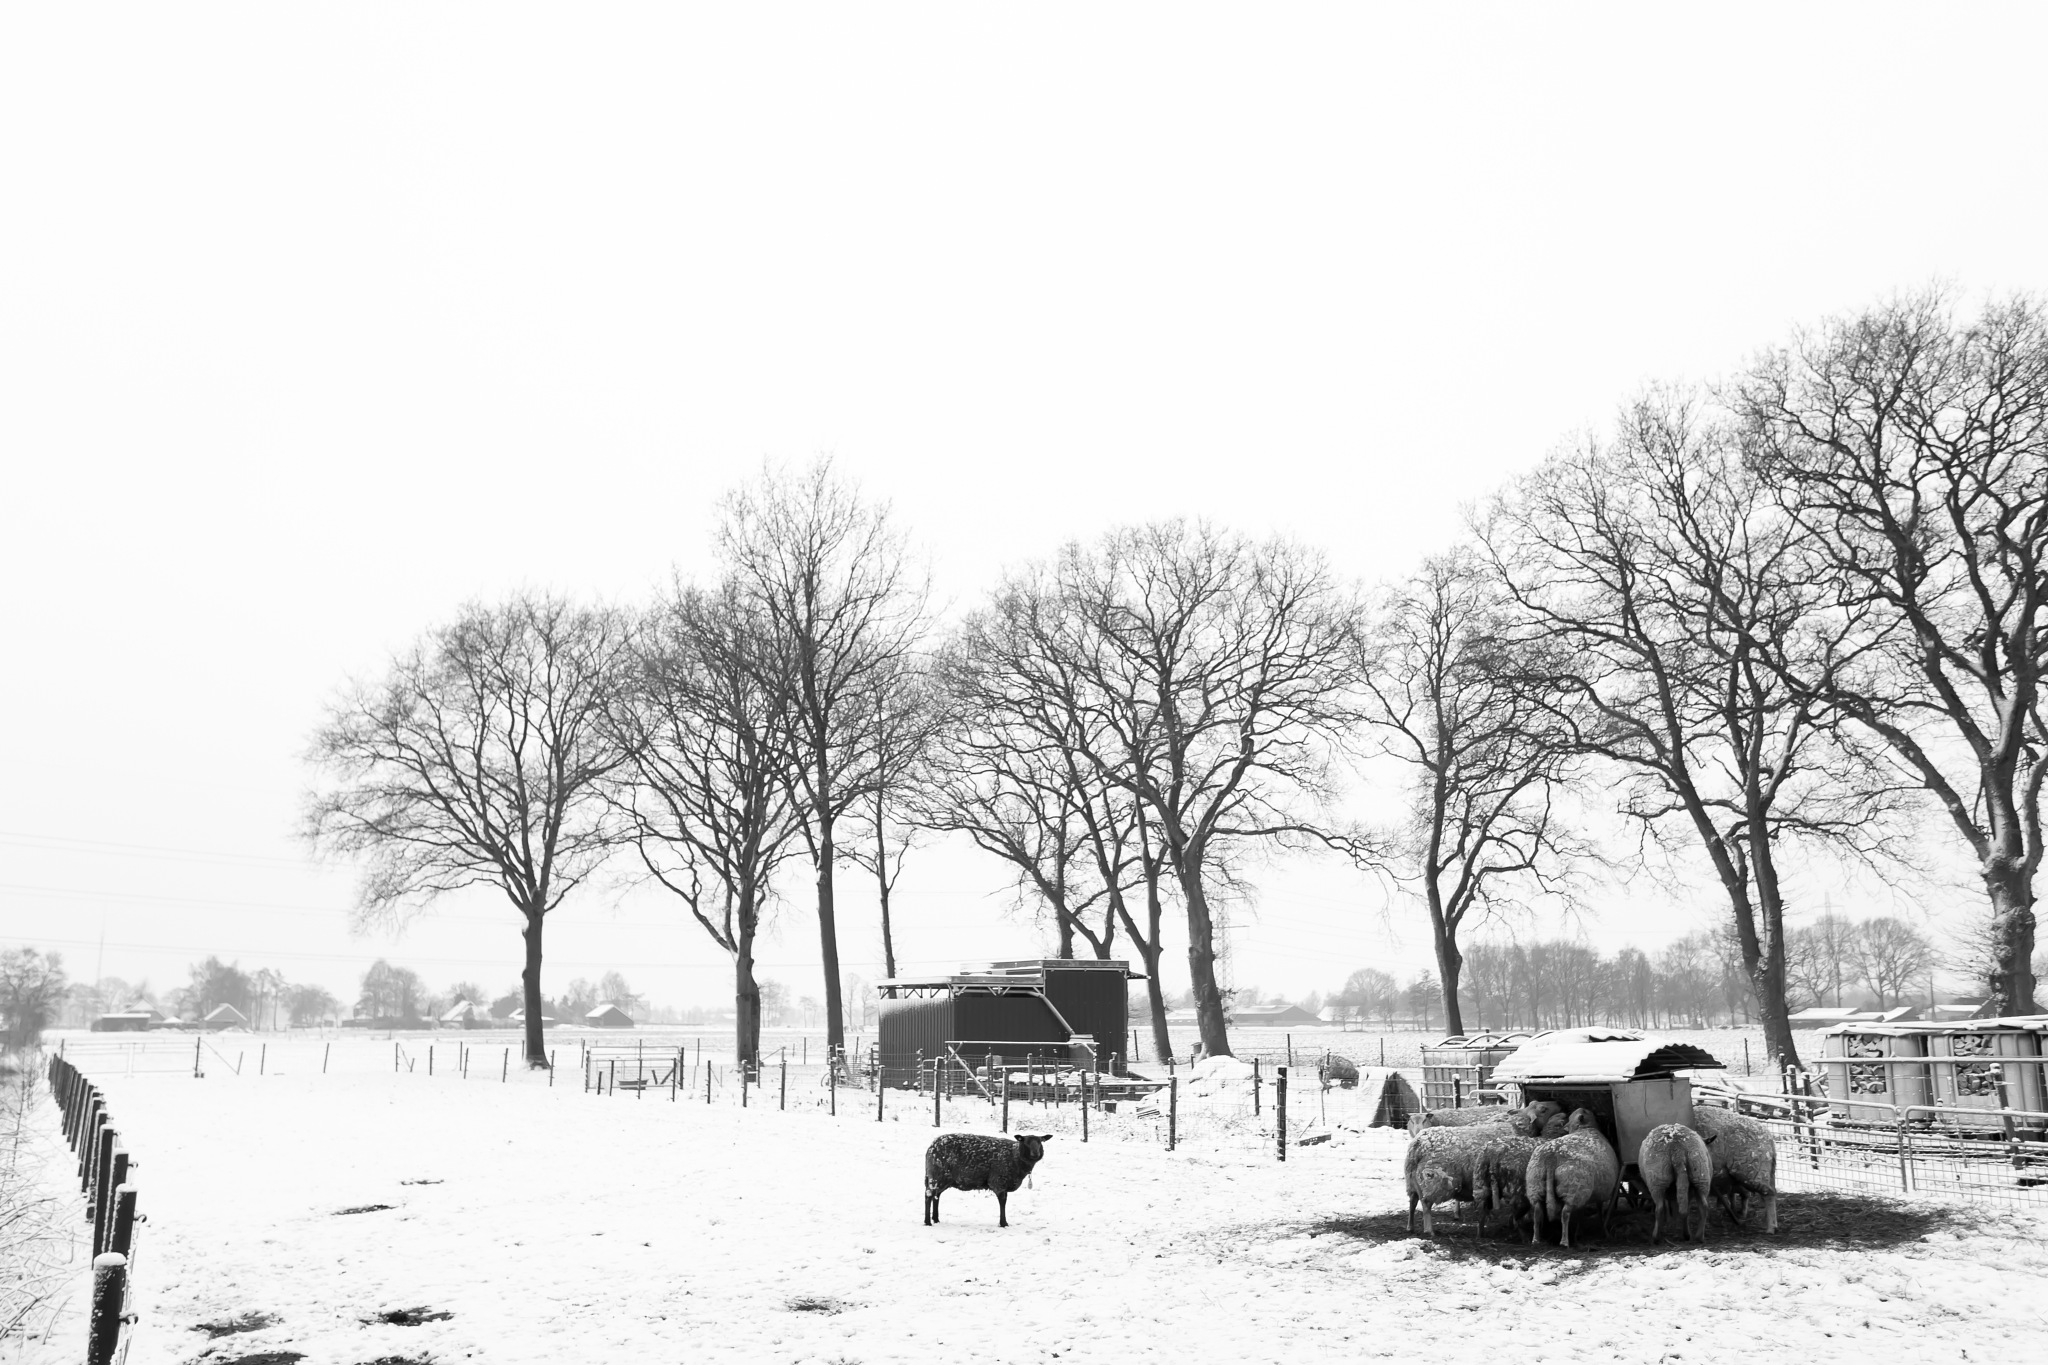 Drenthe, The Netherlands by HansJongman